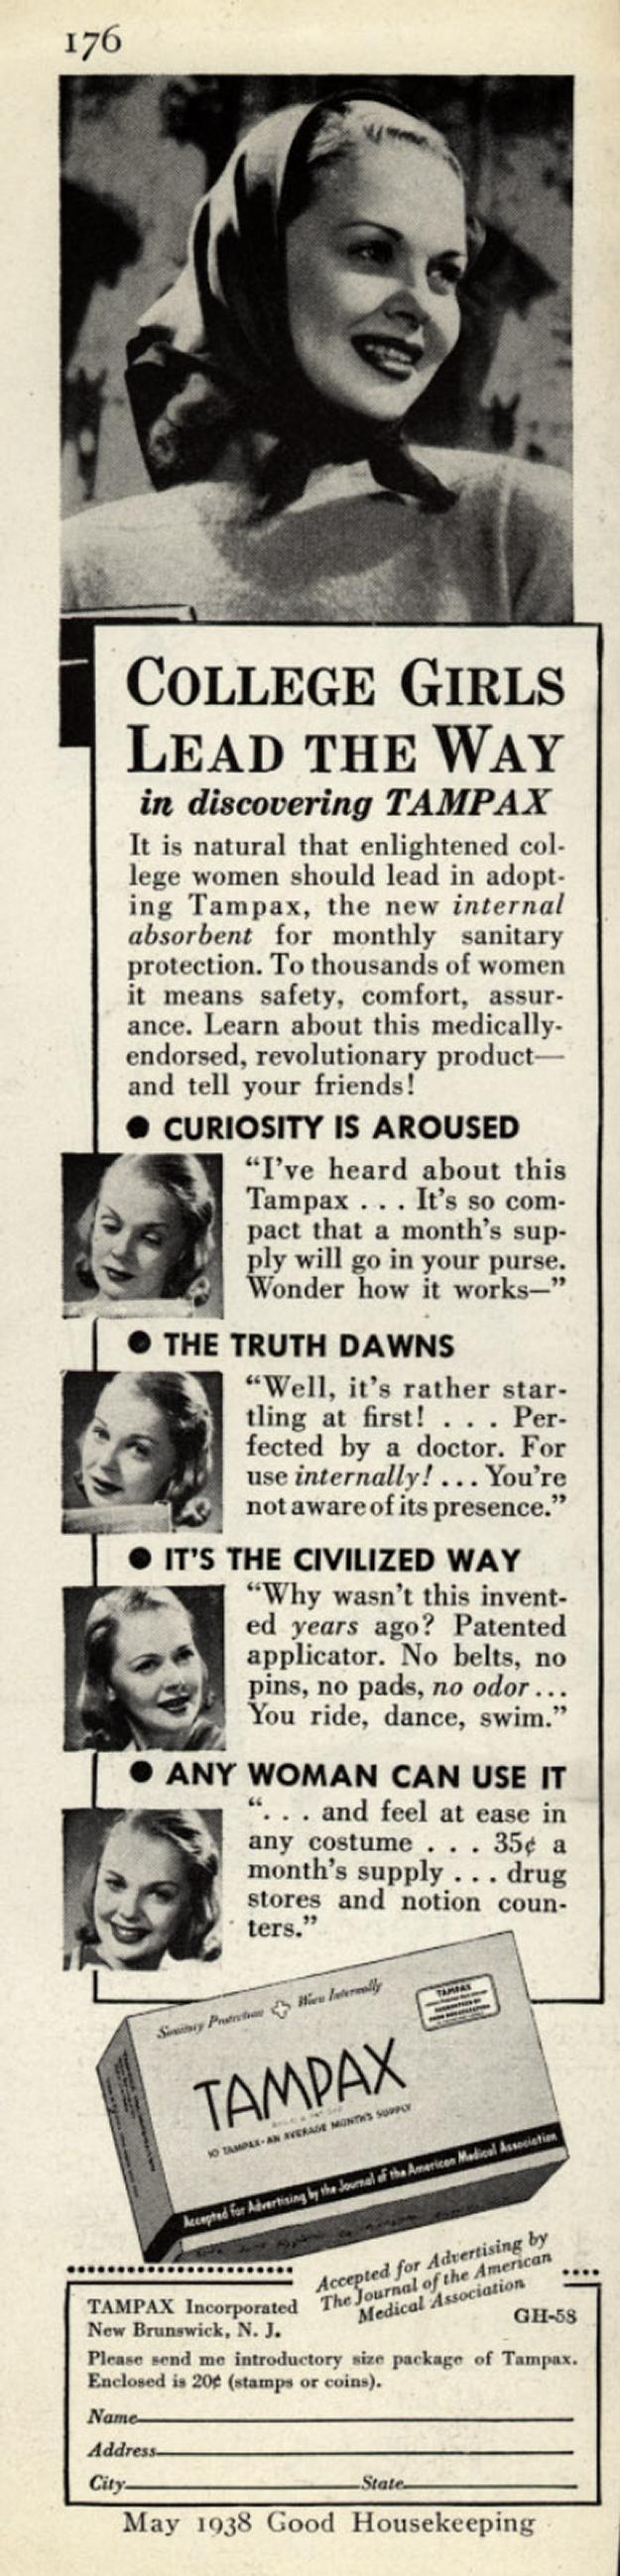 Tampax Inc., 1938